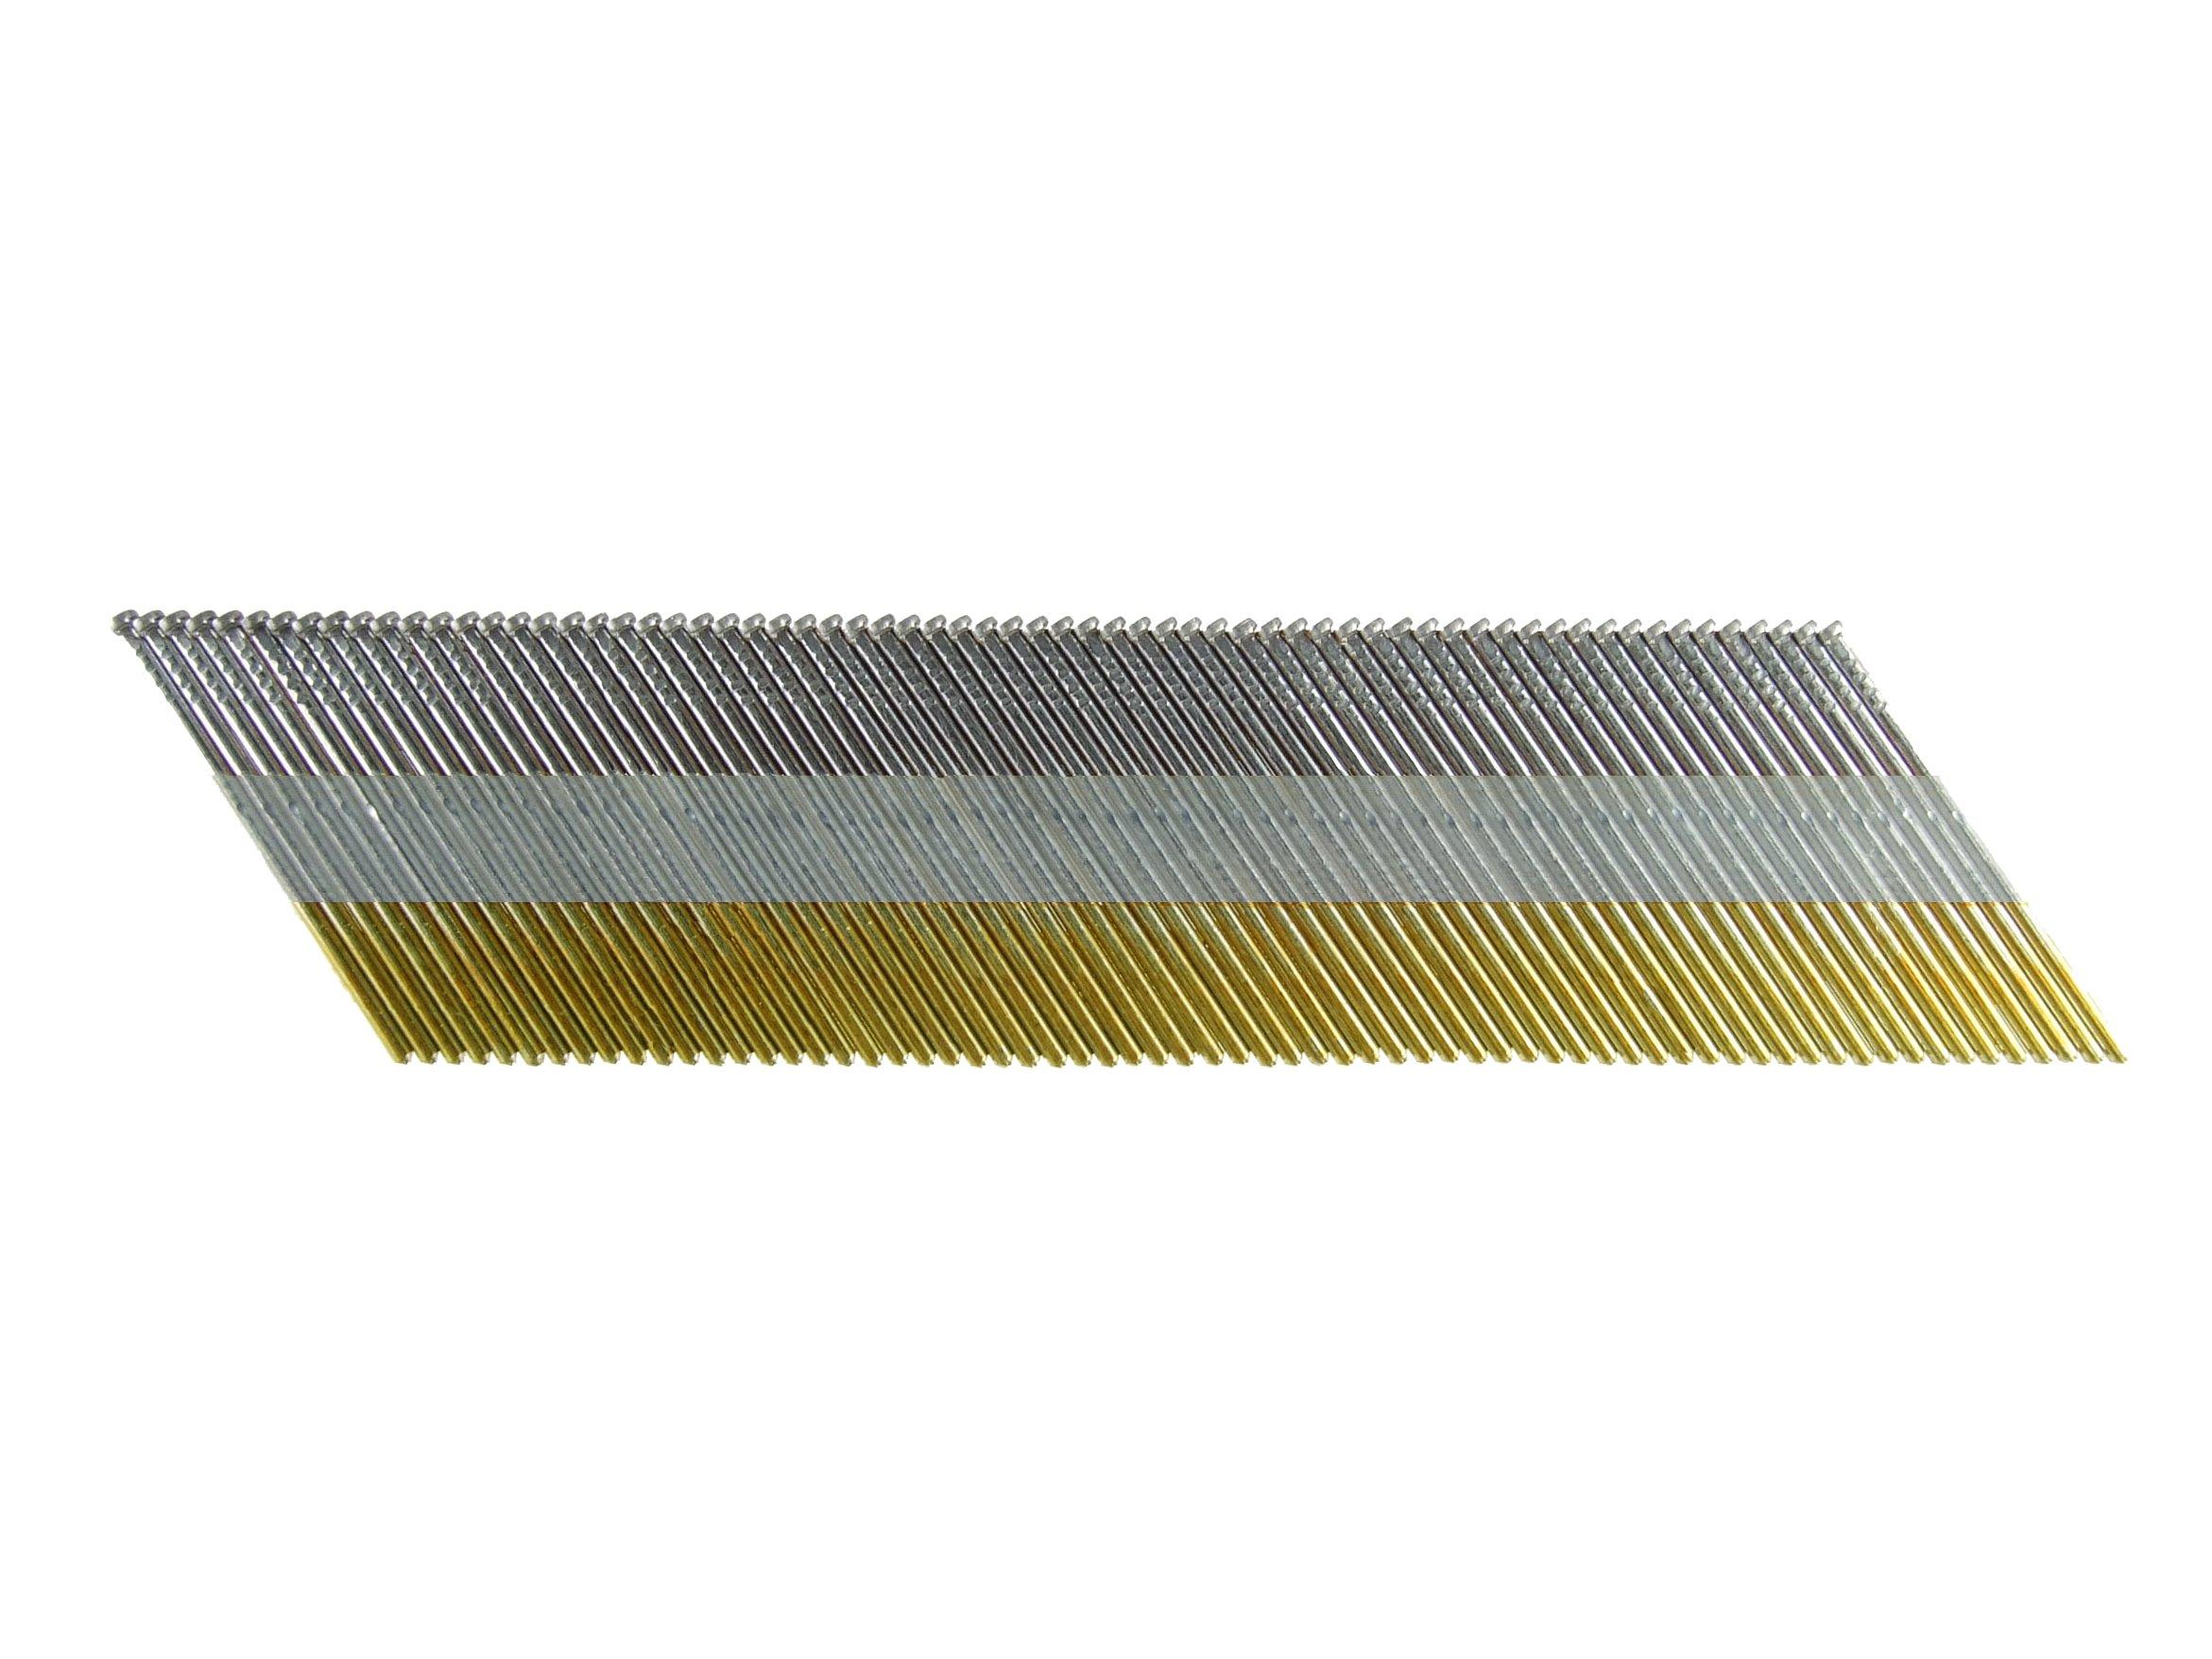 B&C Eagle DA25-1M 2-1/2-Inch x 35 Degree Bright Angle Finish Nails (1,000 per pack) by B&C Eagle (Image #1)